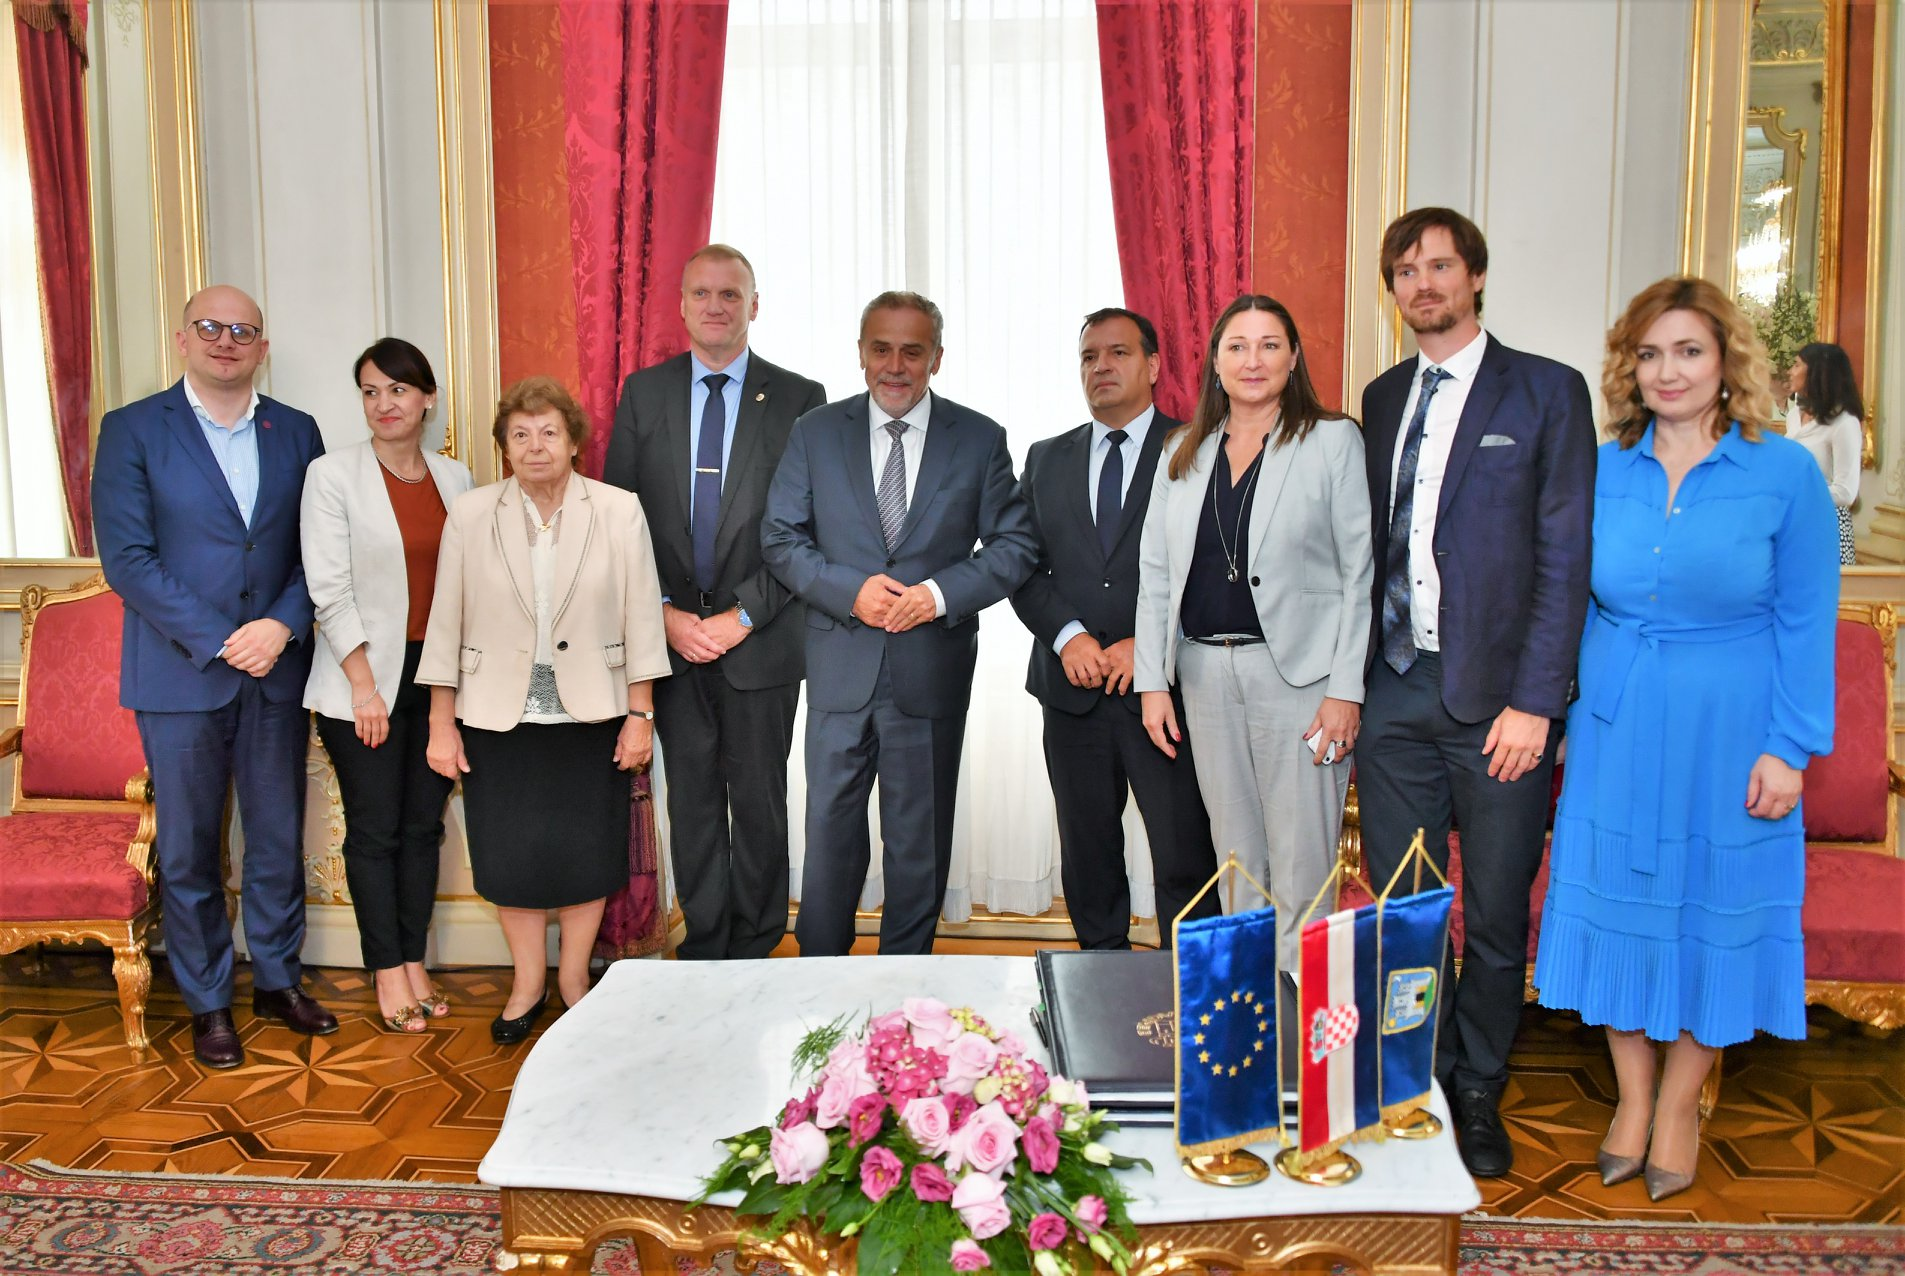 Zagreb se pridružio Europskoj mreži gradova bez droga